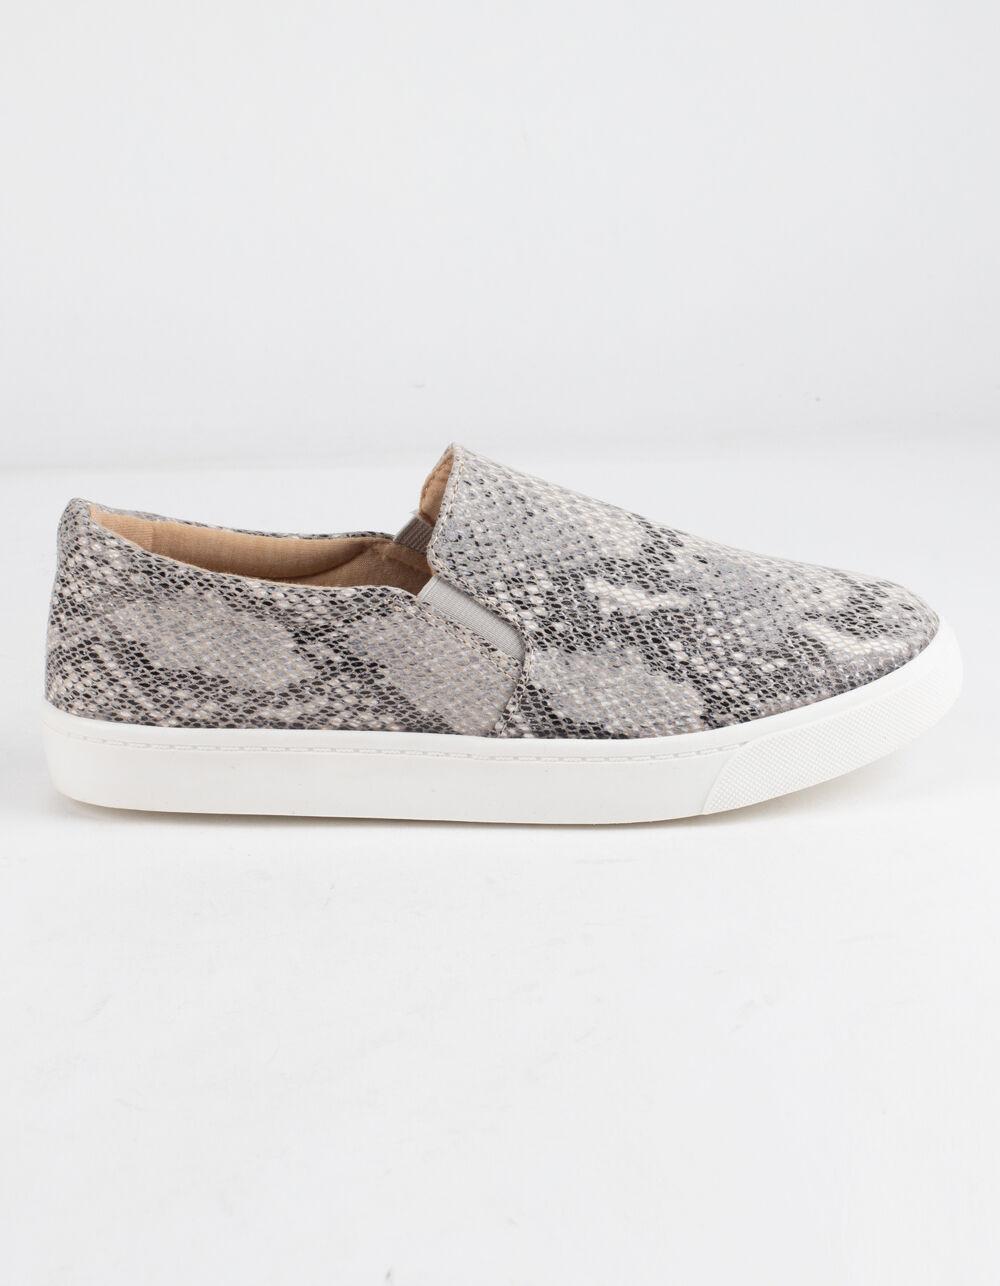 SODA Reign Beige Python Slip-On Shoes